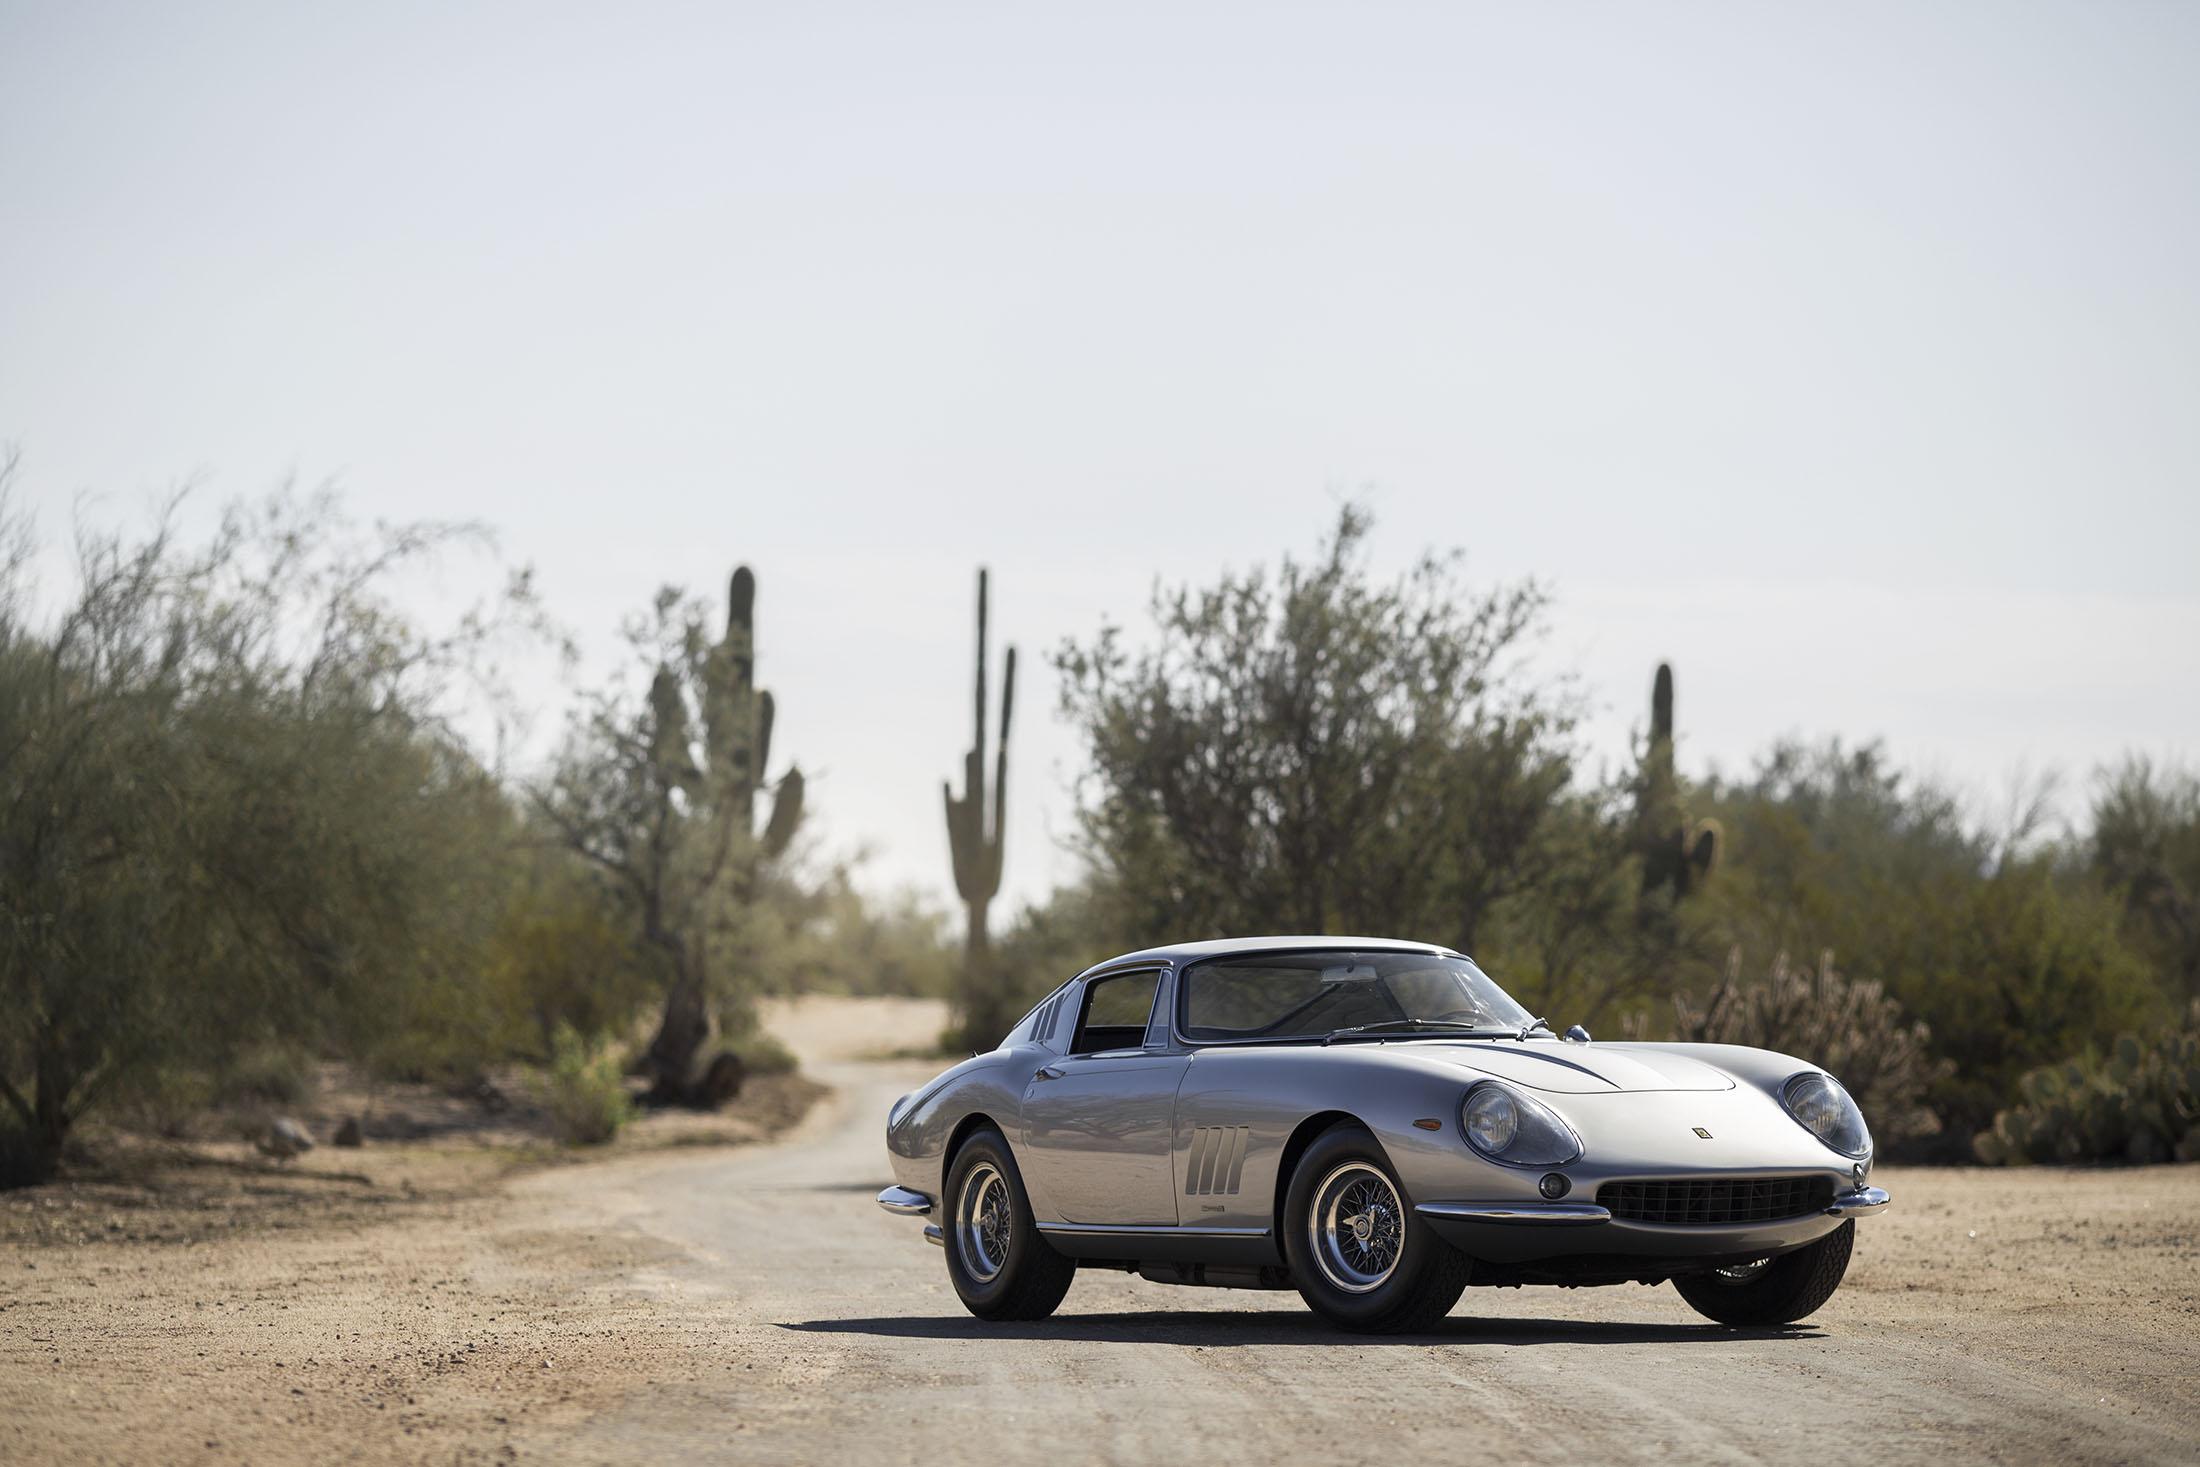 $2,750,000 — 1967 Ferrari 275 GTB/4 Coupe